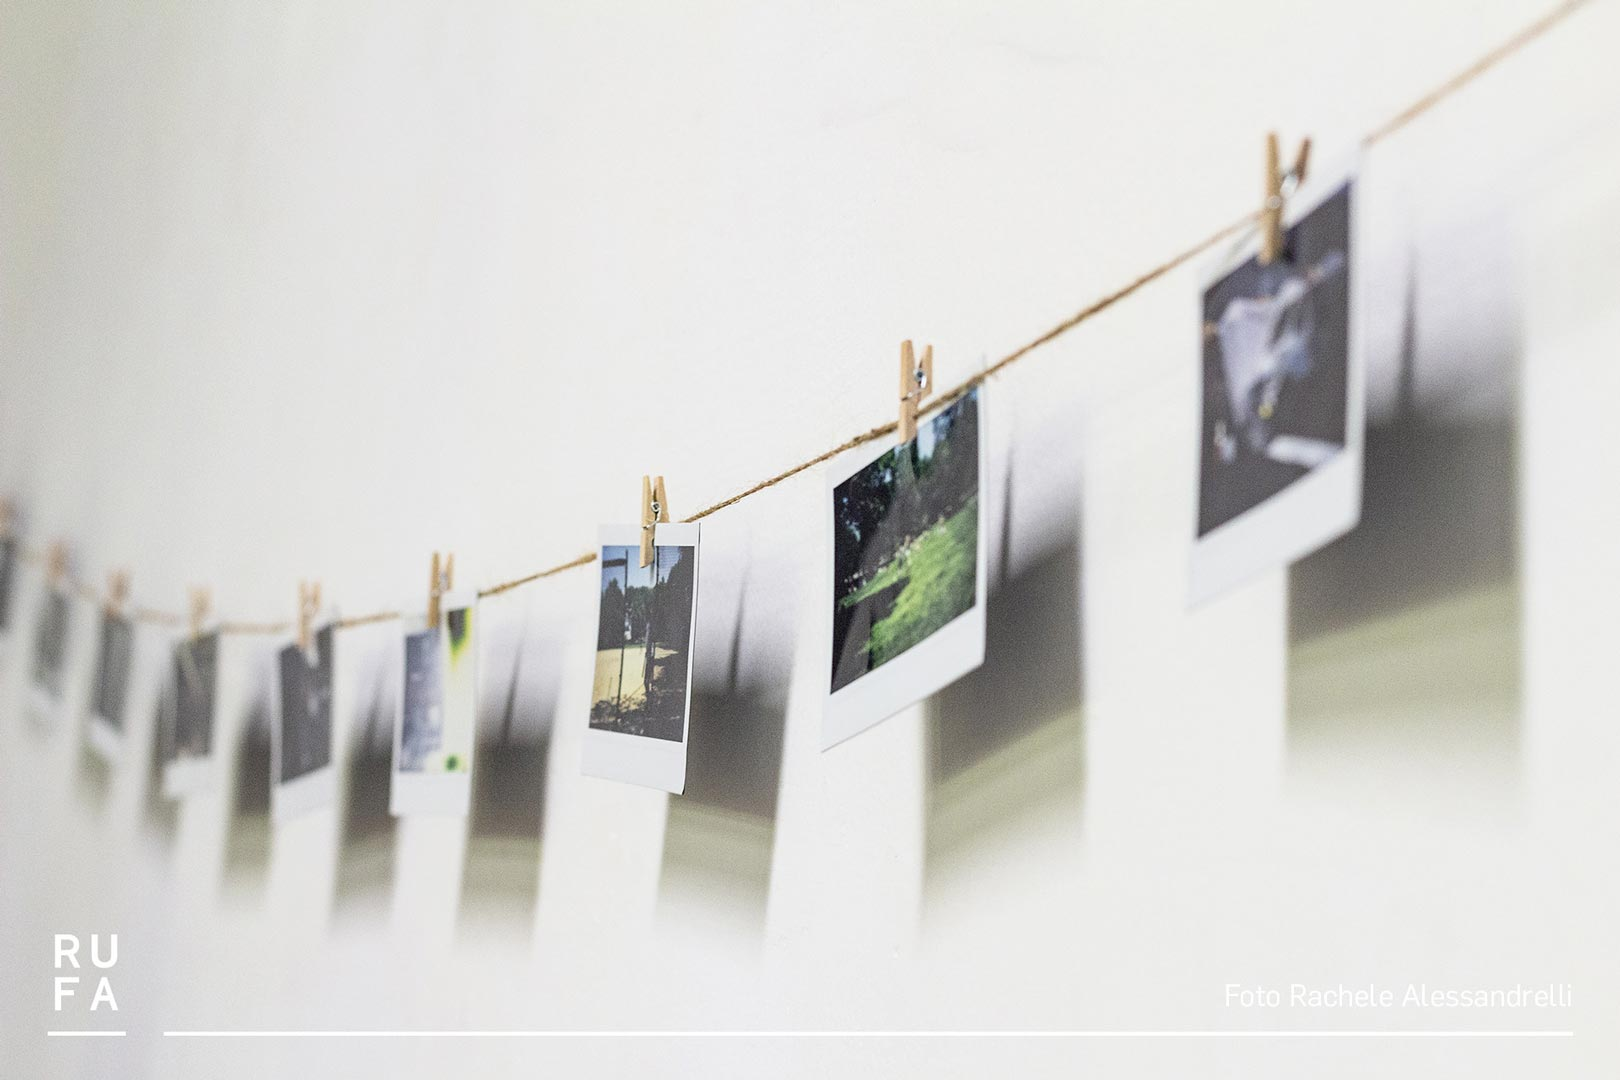 polaroids hung on a string